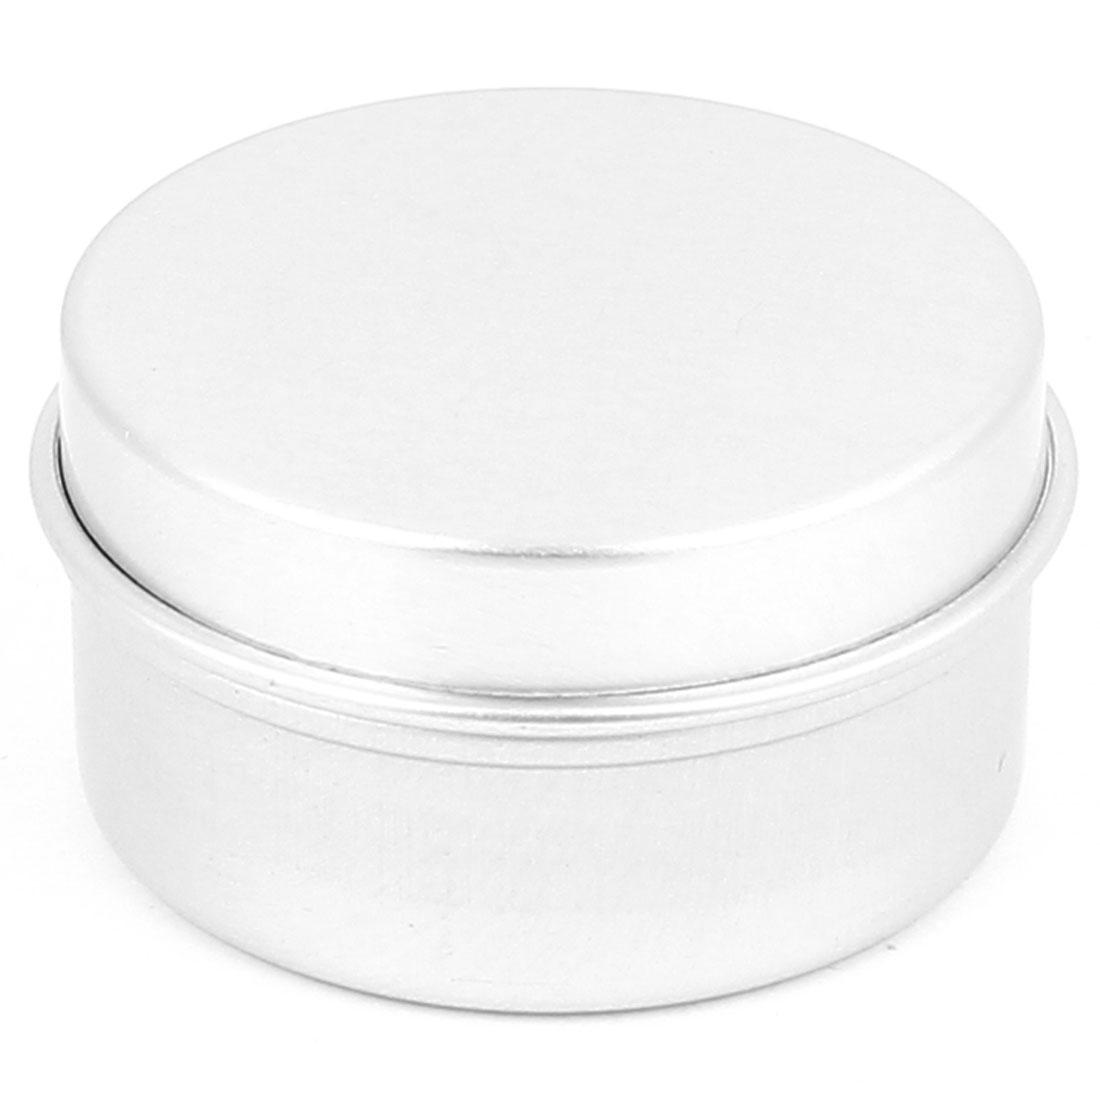 Silver Tone Aluminum Cosmetic Empty Jar Pot Lip Gloss Balm Eyeshadow Box Container Holder 20g